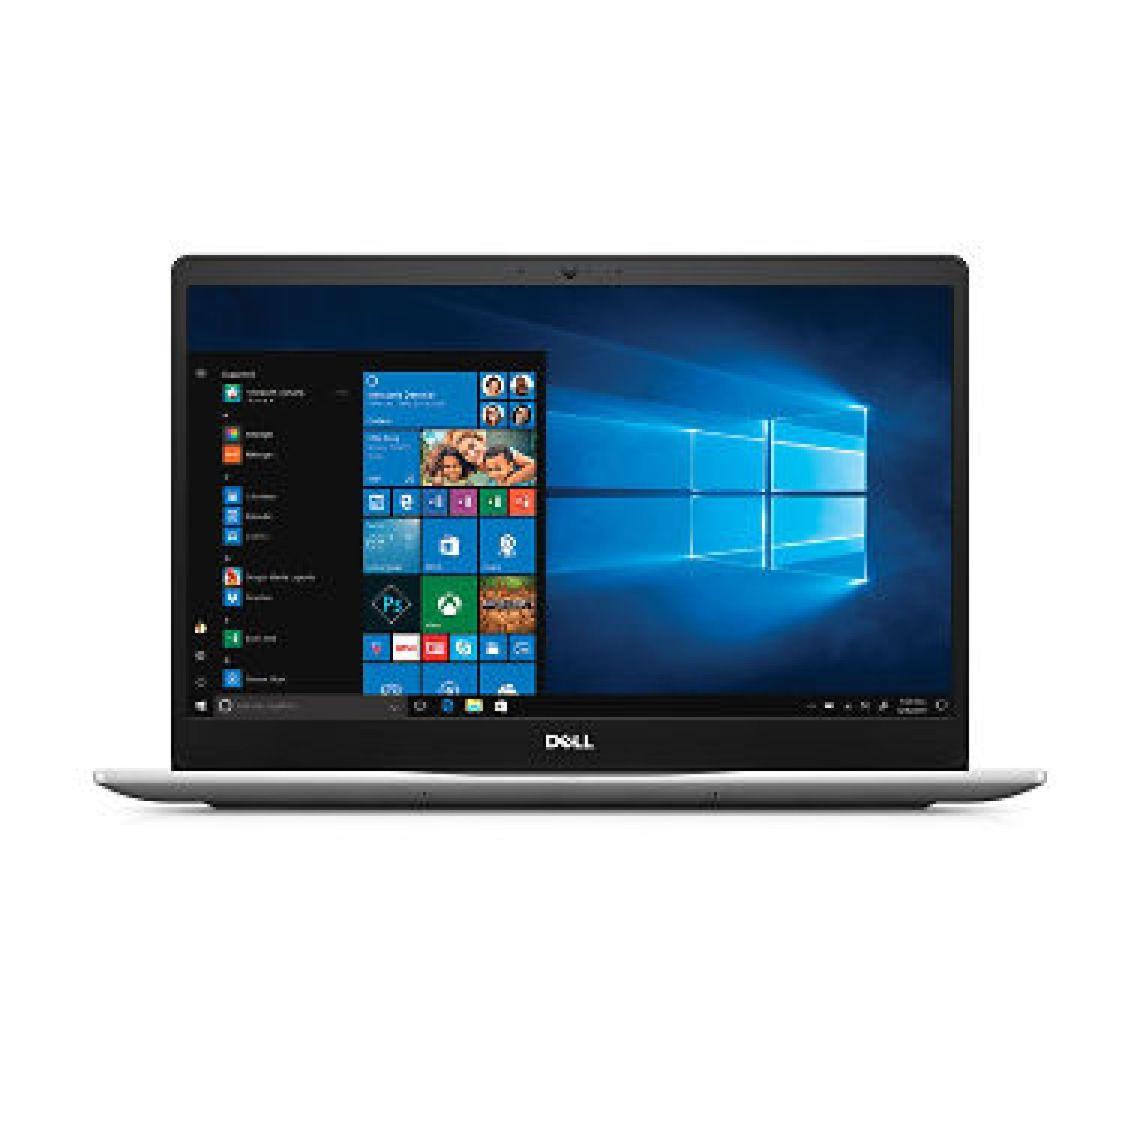 "Dell Inspiron Full HD IPS Touchscreen 15.6"" Notebook, Intel Core i7-8550U Processor, 8GB Memory, 1TB Hard Drive + 8GB SSD, 4GB NVIDIA GeForce 940MX GDDR5 Graphics, Backlit Keyboard, HD Webcam, Windows 10 Home - Sam's Club"